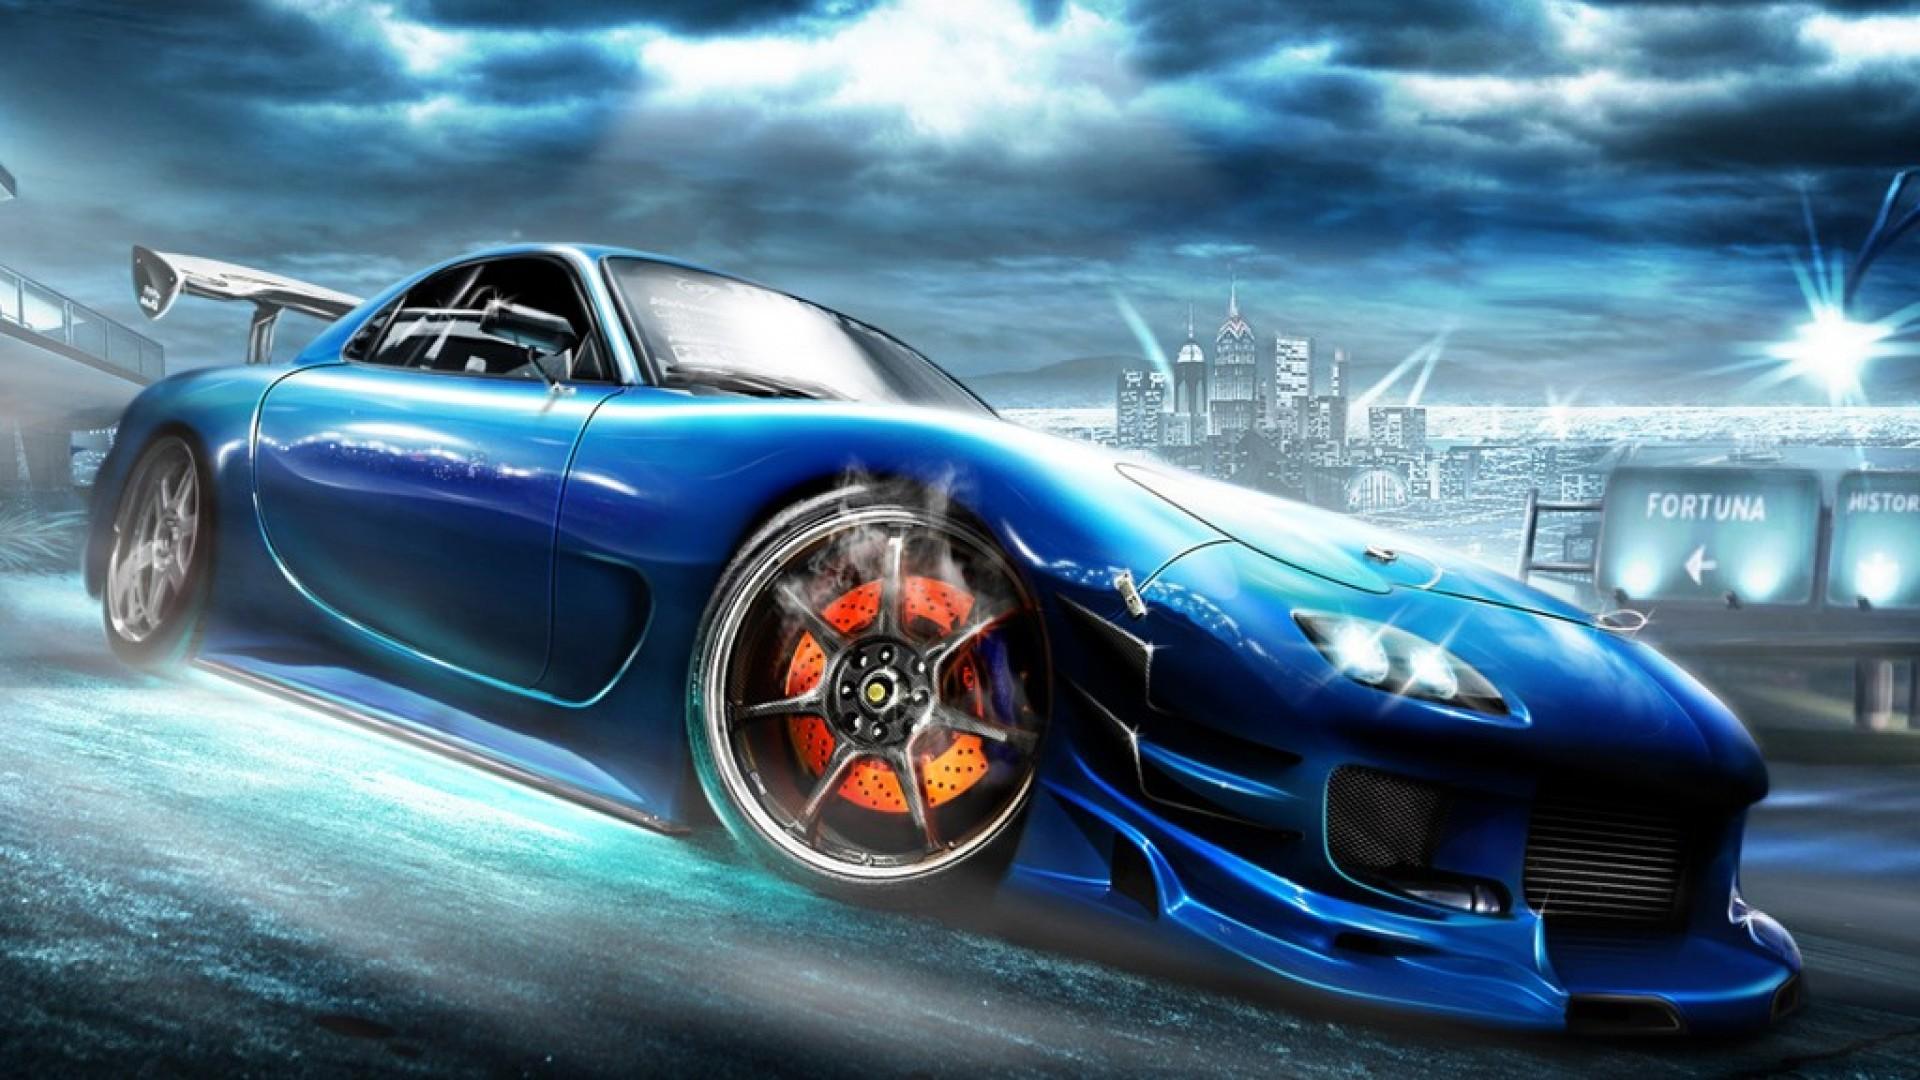 Cool Mazda RX7 Wallpaper